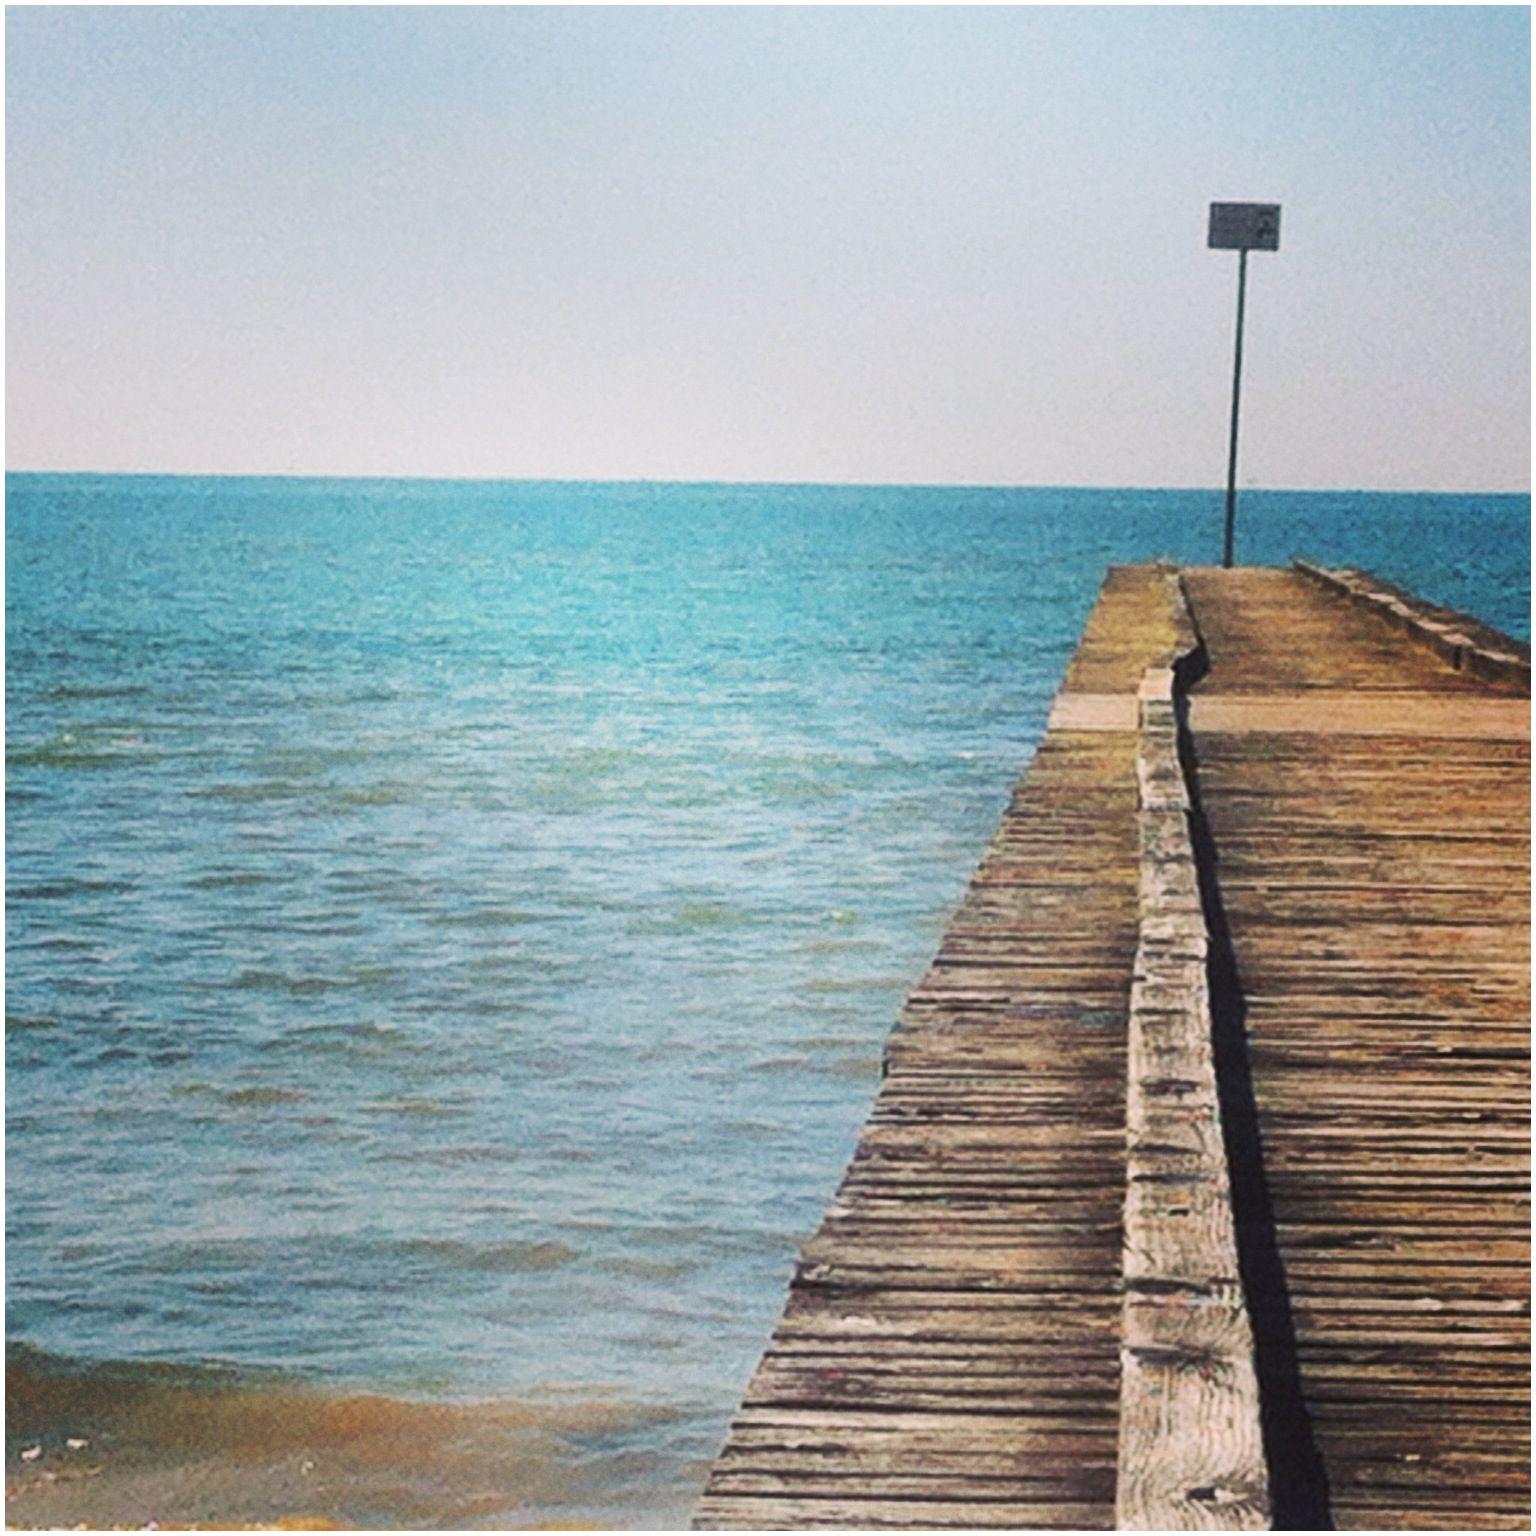 Lido di Jesolo Adriatico Italy Holidays Visit Italy City Beach Cinque Terre